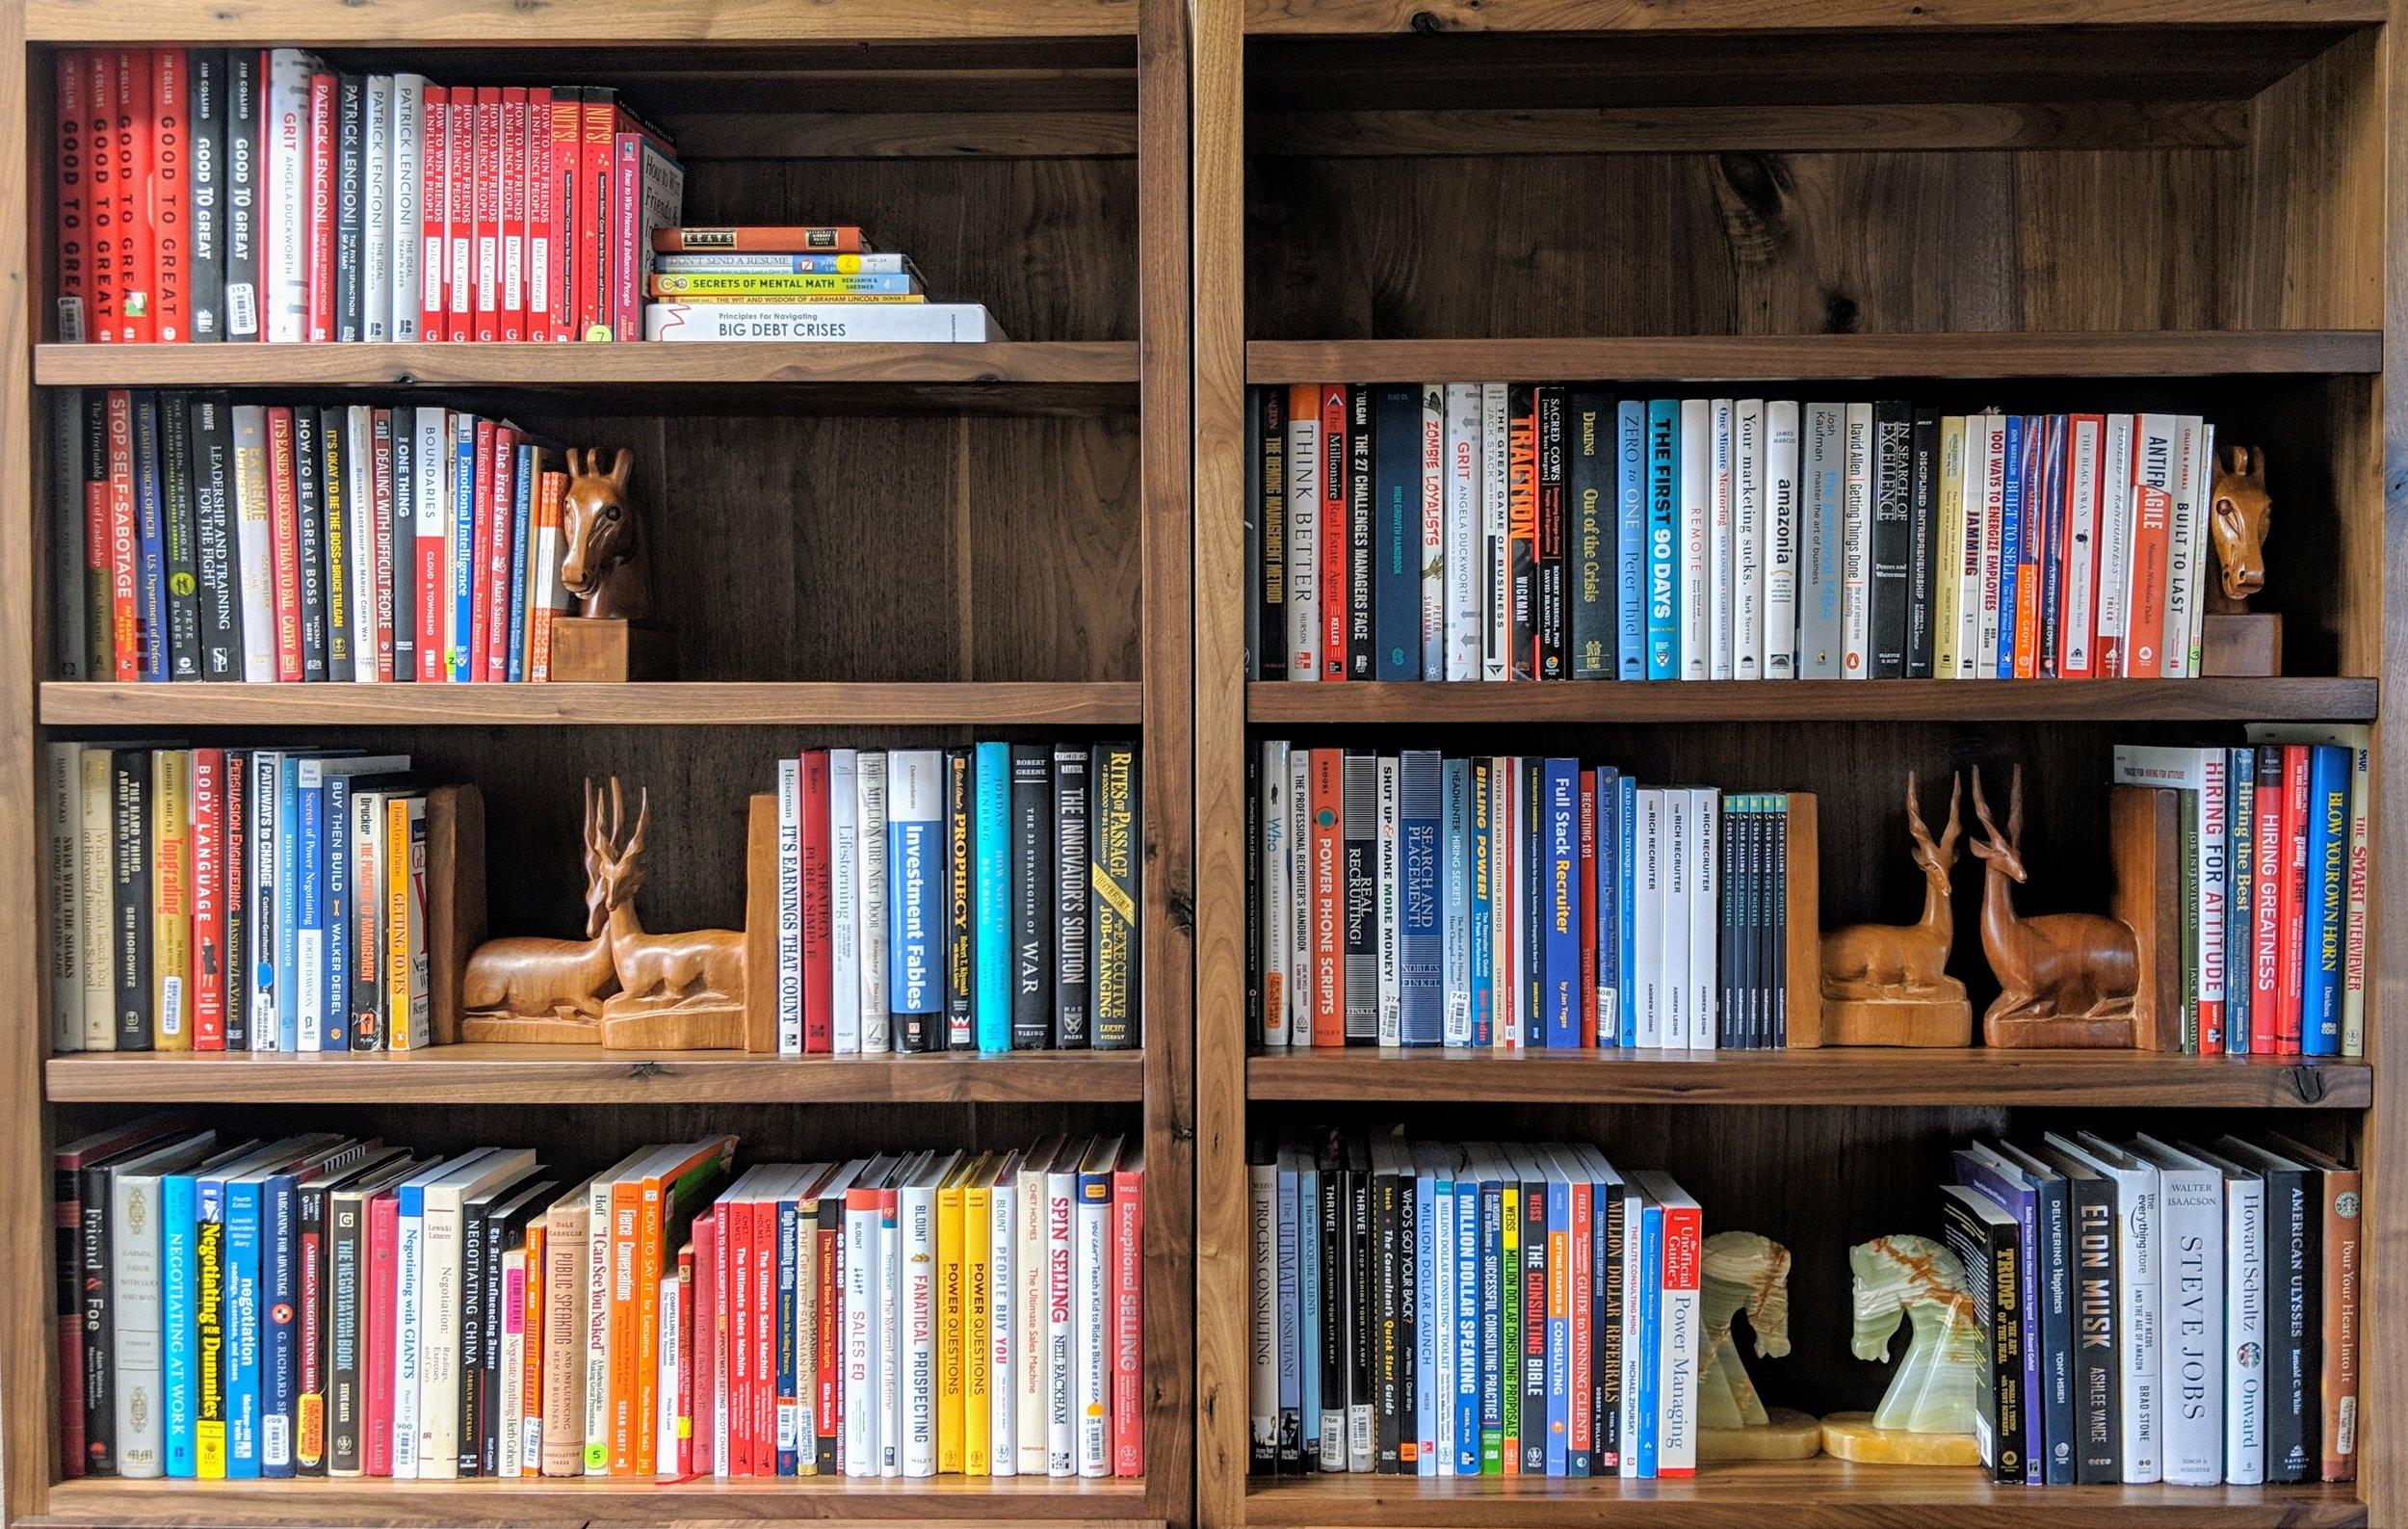 Our actual bookshelf.